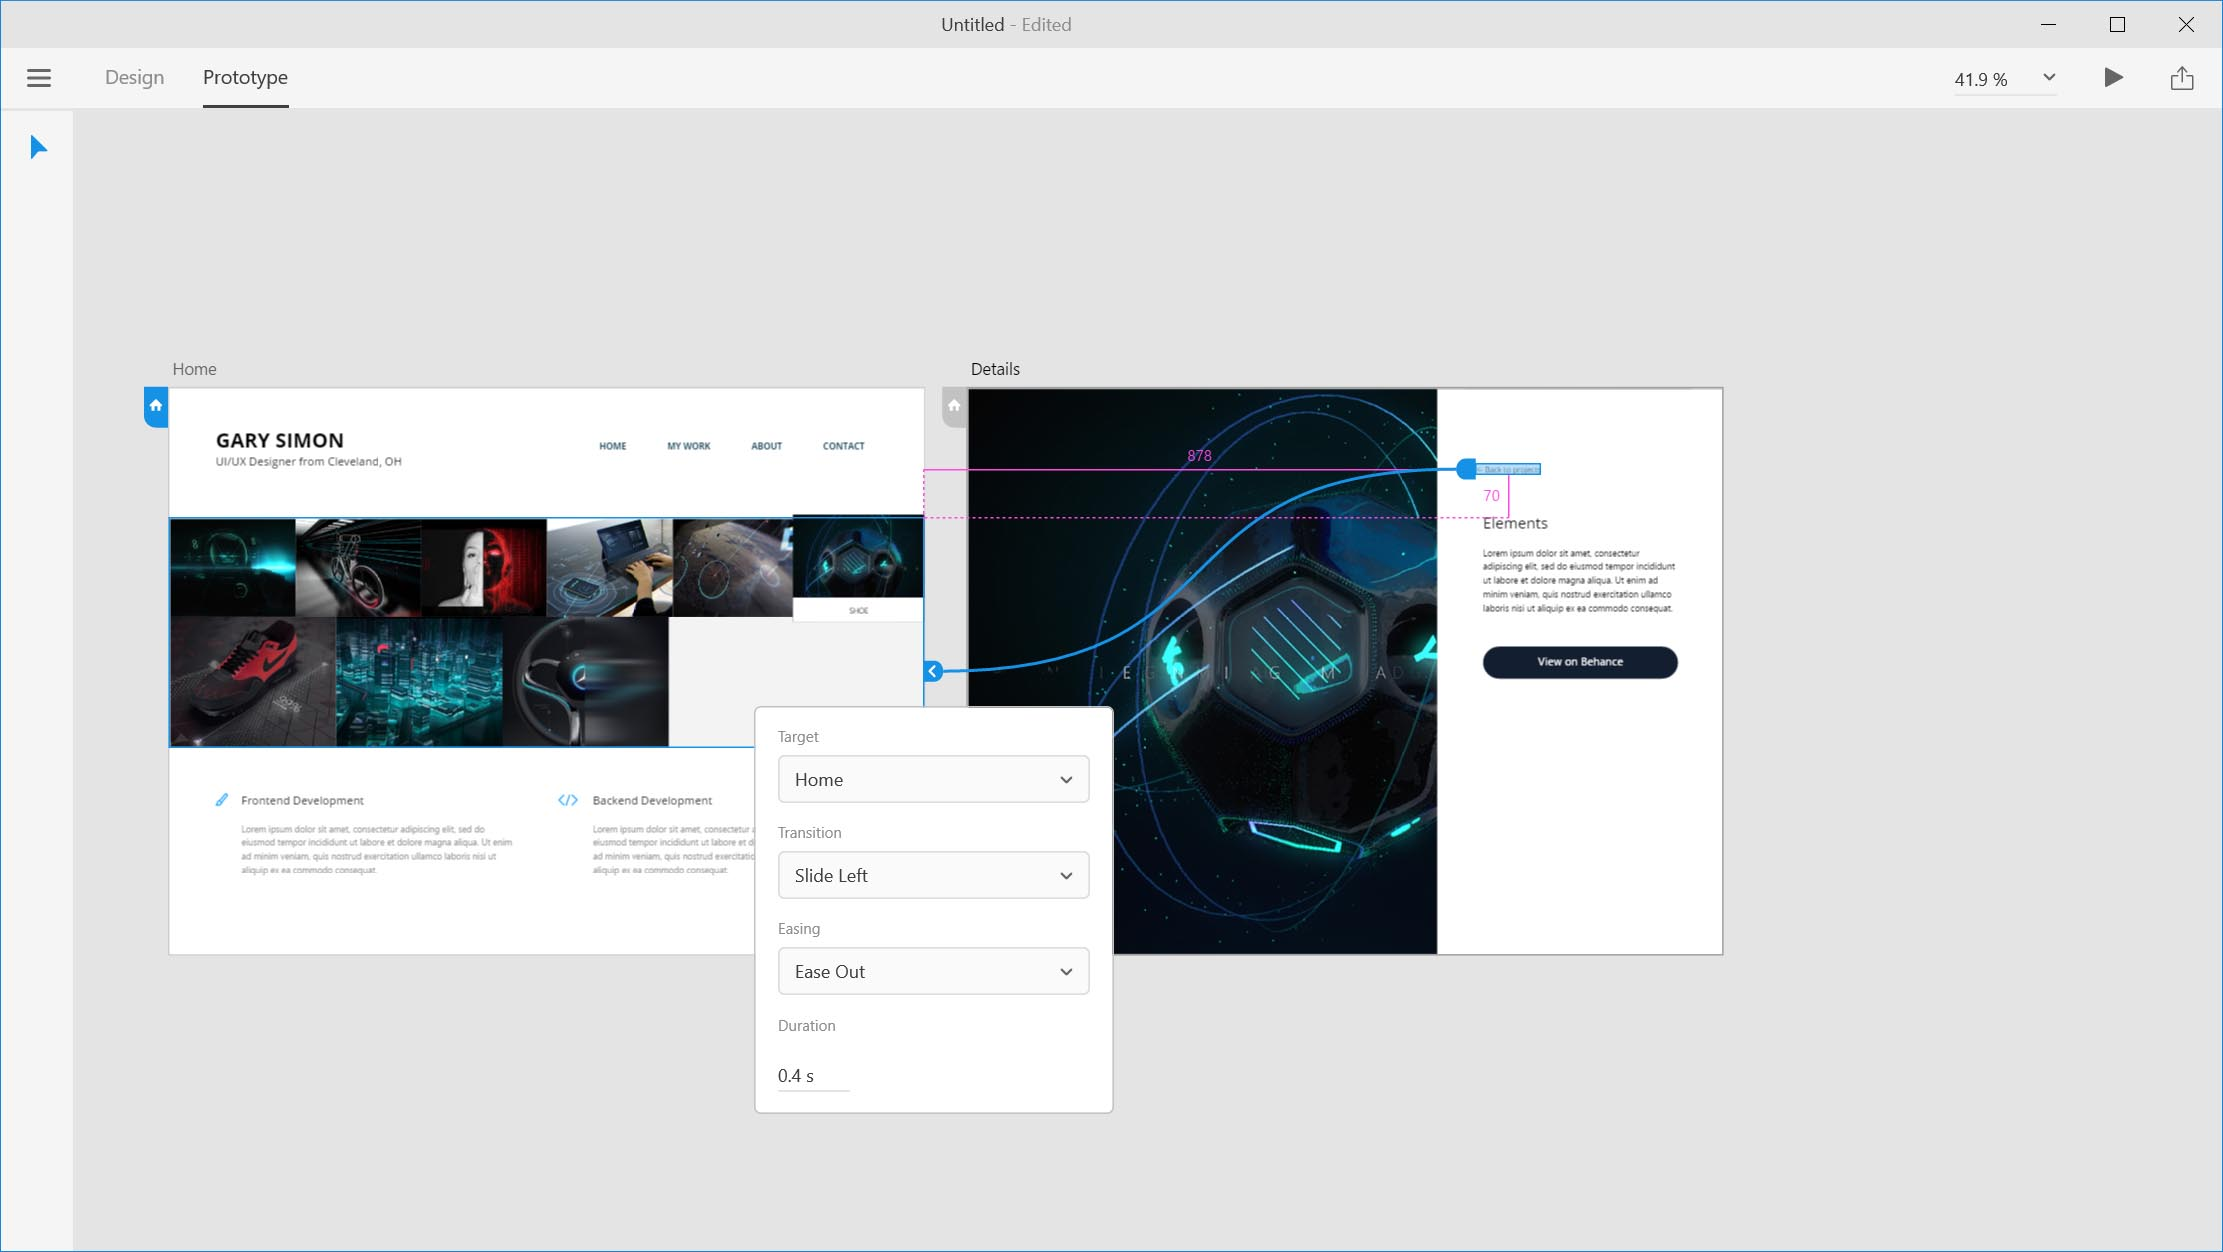 Website Design in Adobe XD Tutorial